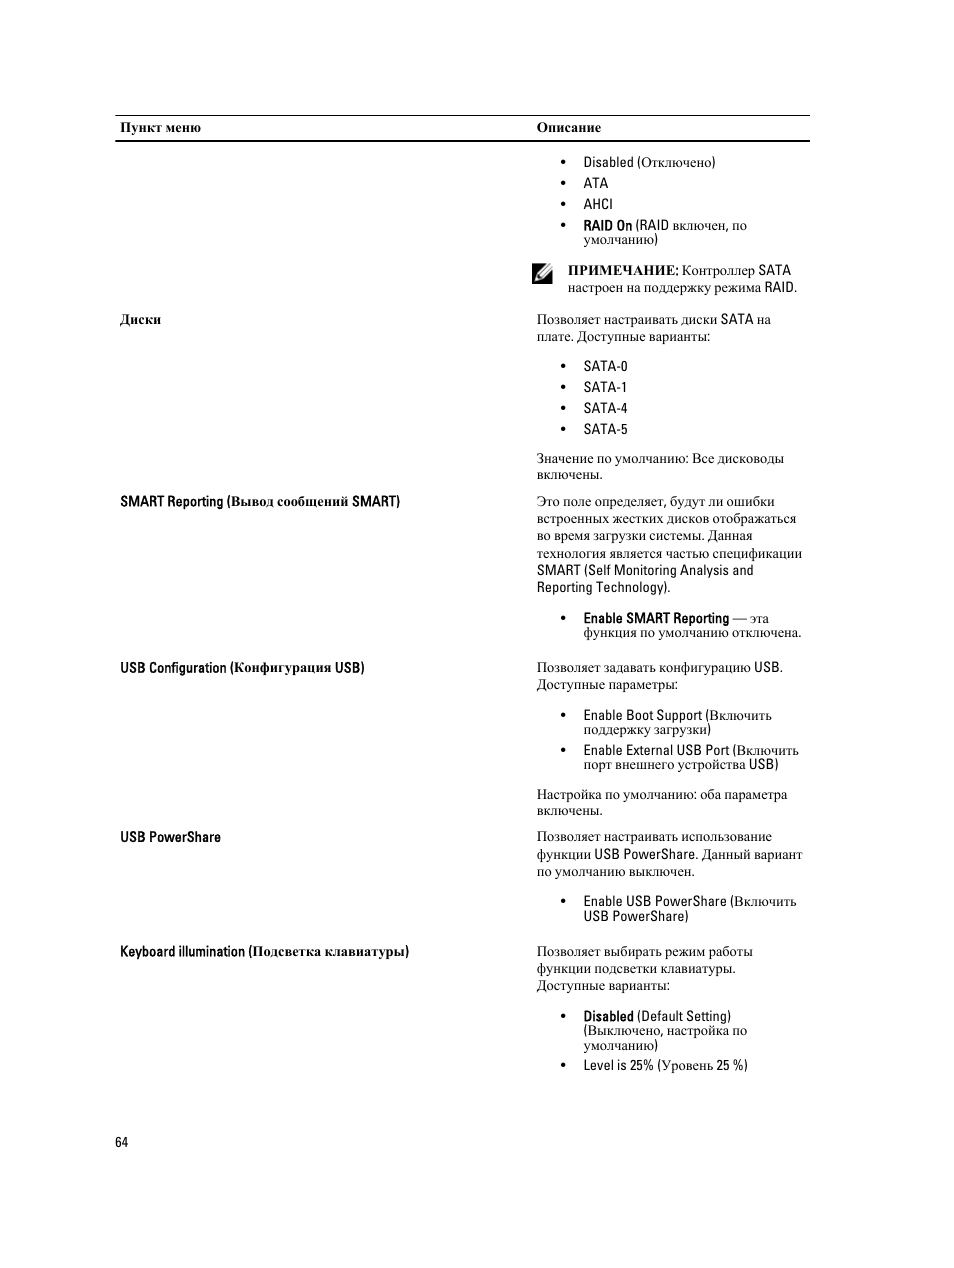 Инструкция по эксплуатации Dell Latitude E6430 ATG | Страница 64 / 87